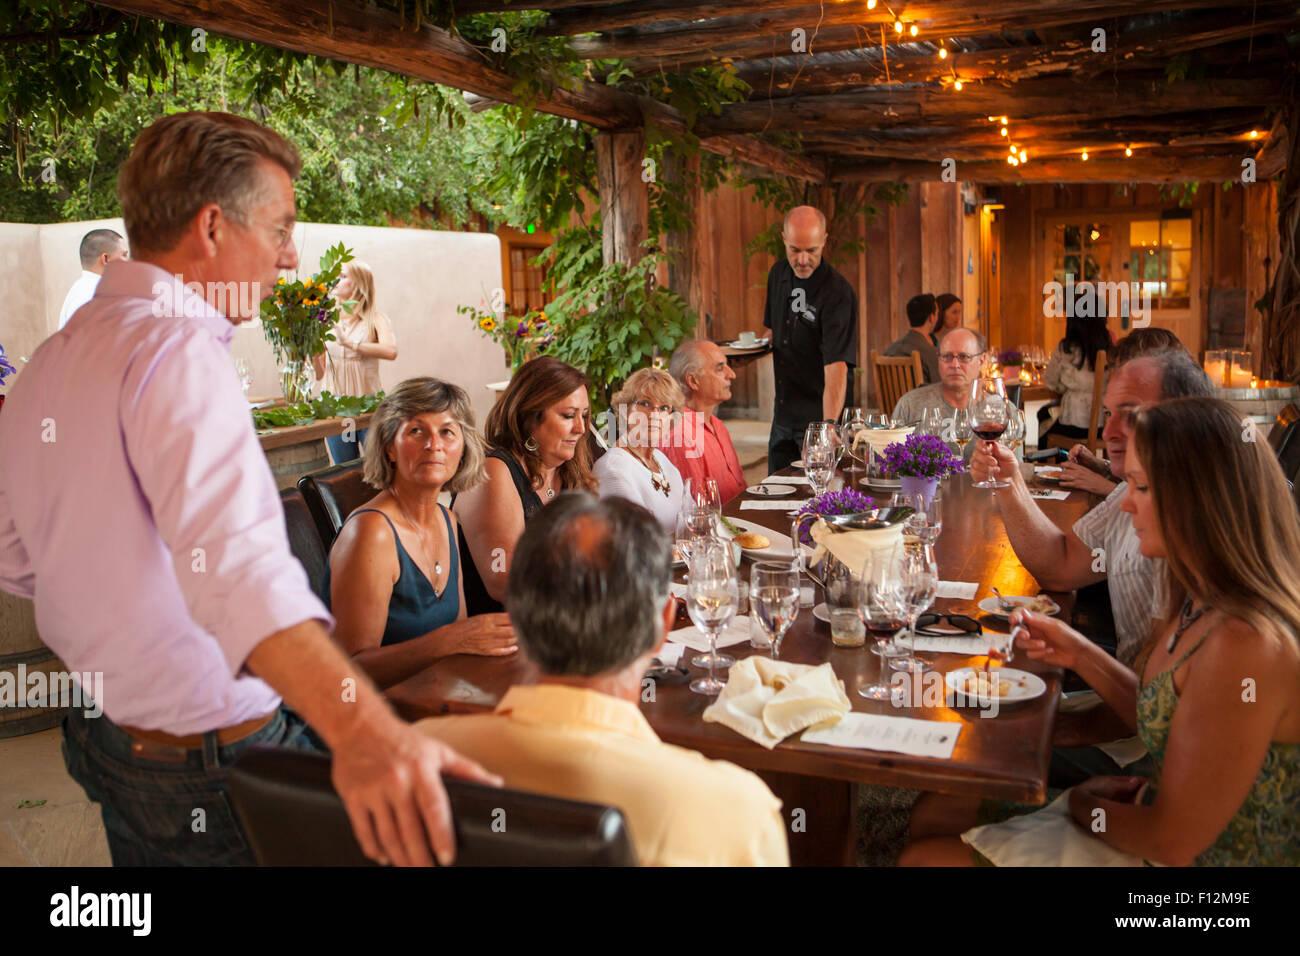 Members' Dinner at Roblar Winery, Santa Ynez Valley, California - Stock Image